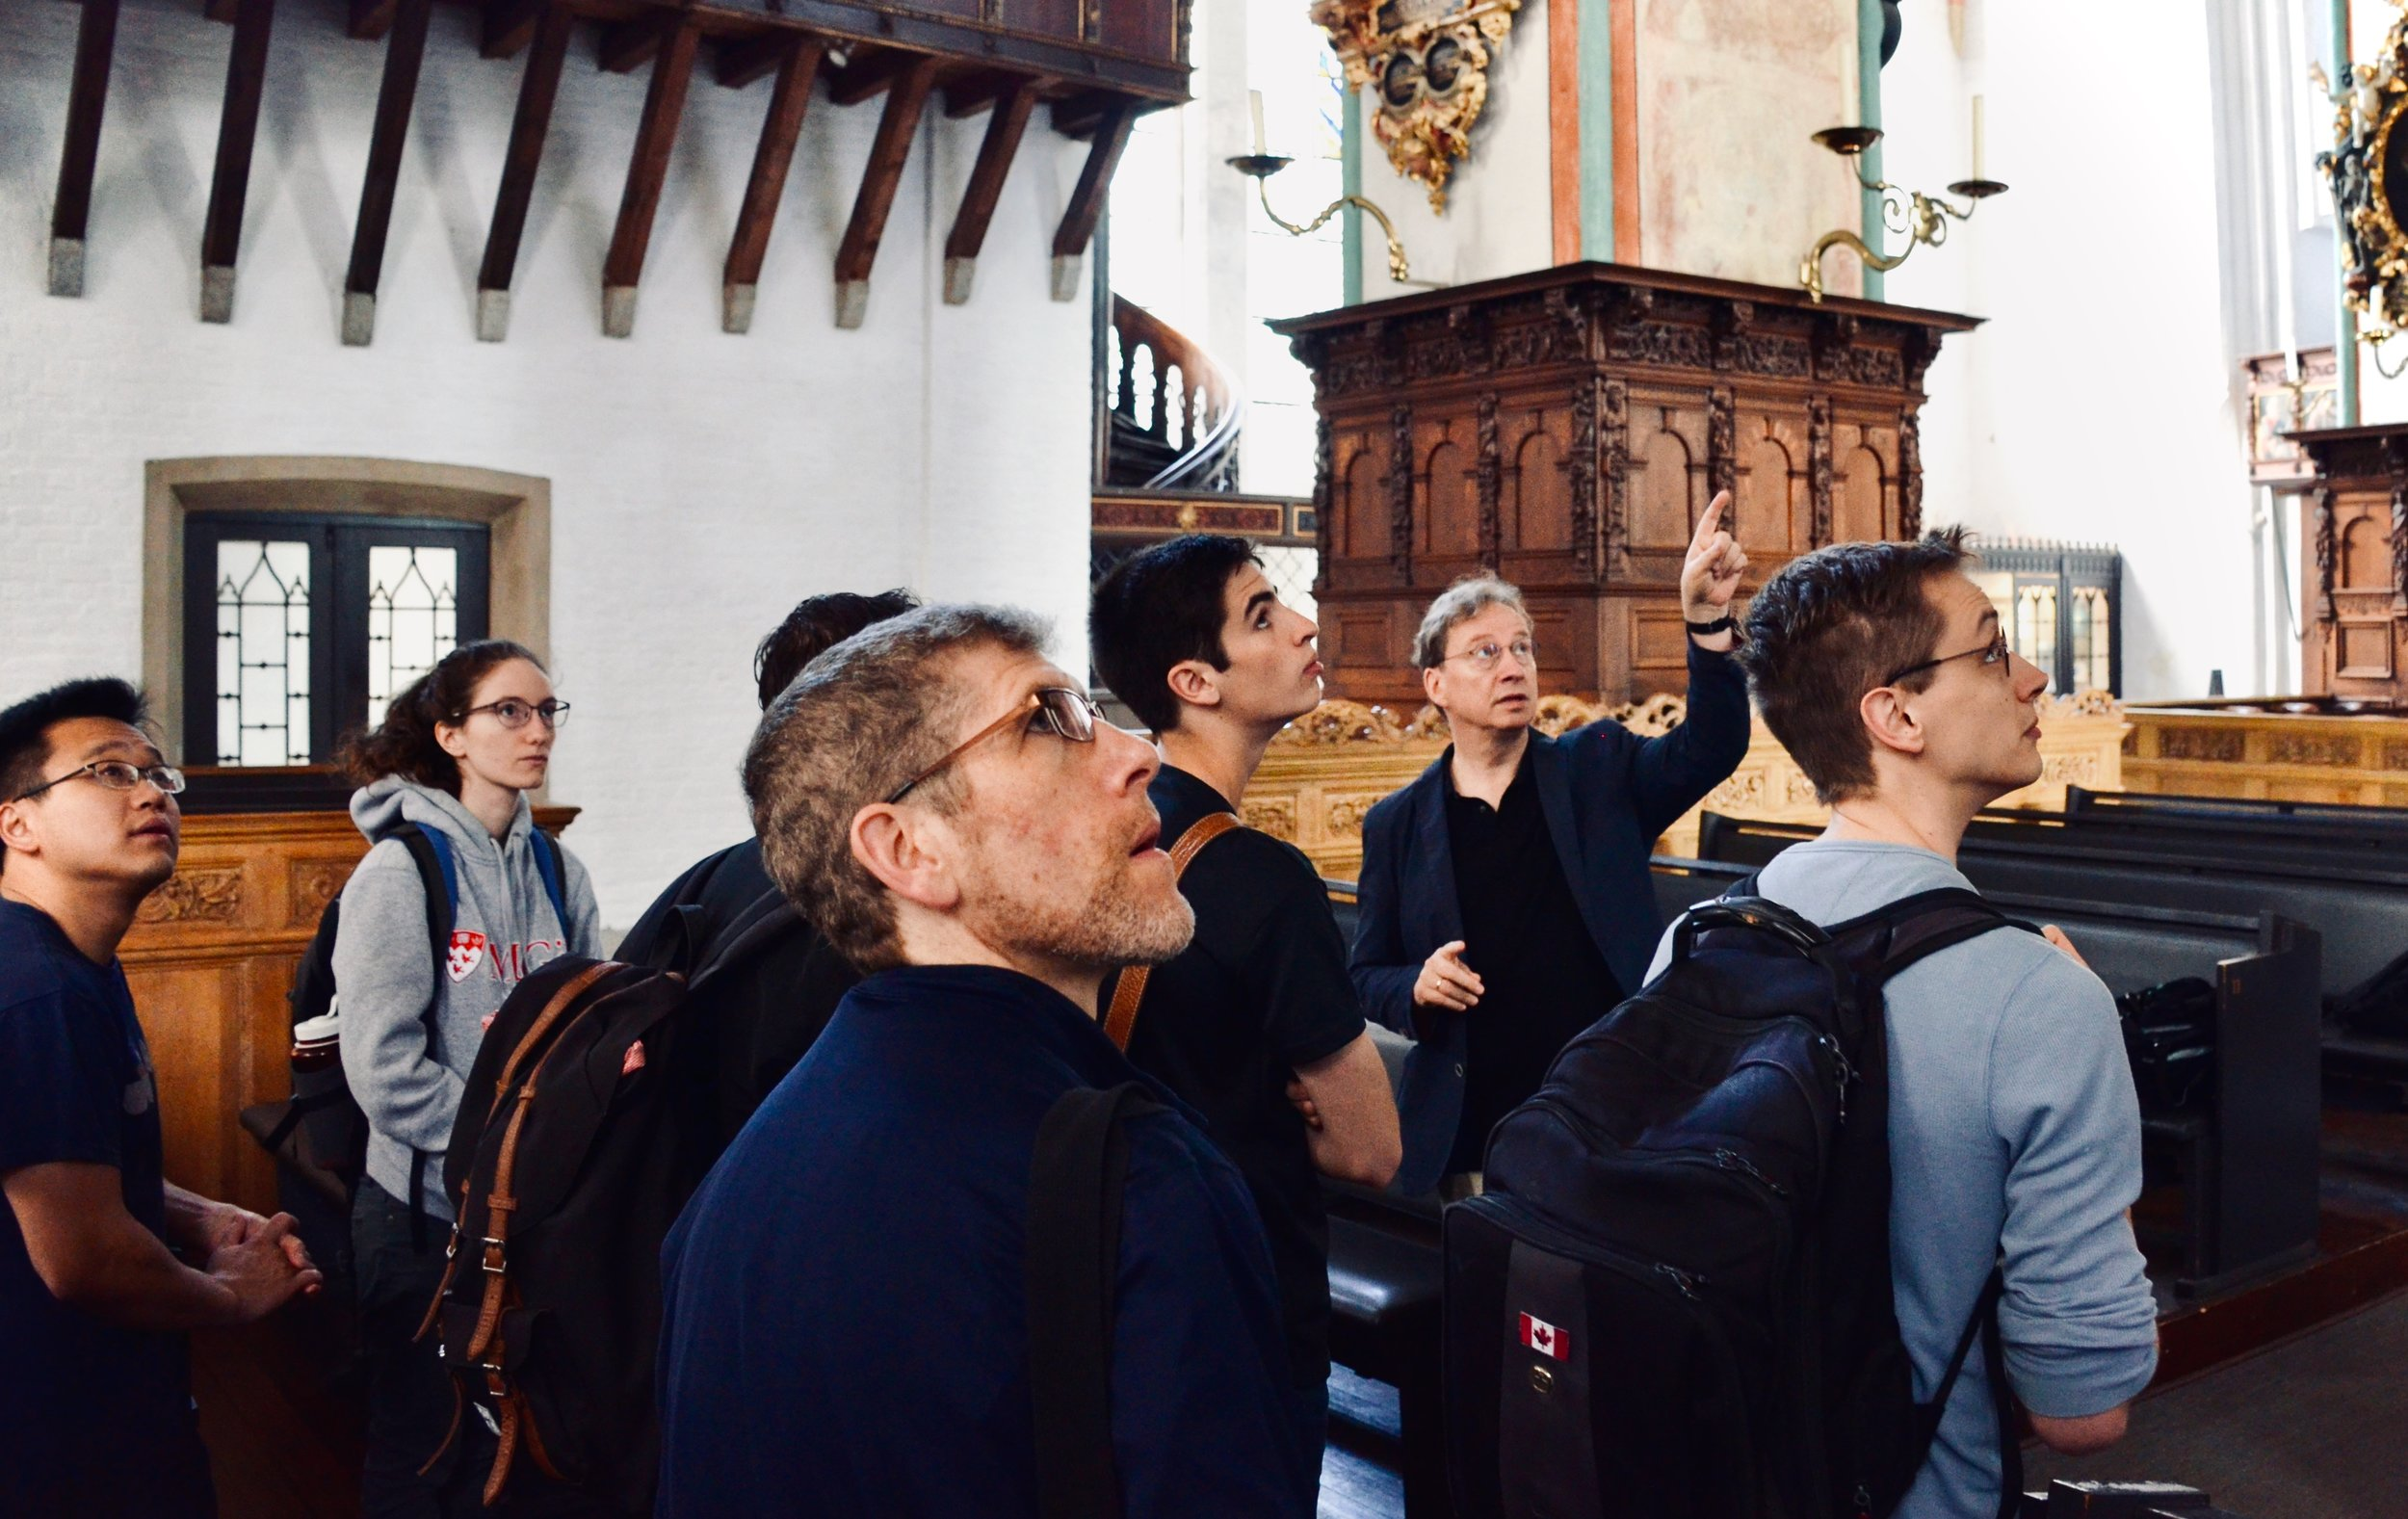 Prof. Arvid Gast welcomes Boston Organ Studio to St. Jakobi, Lübeck.